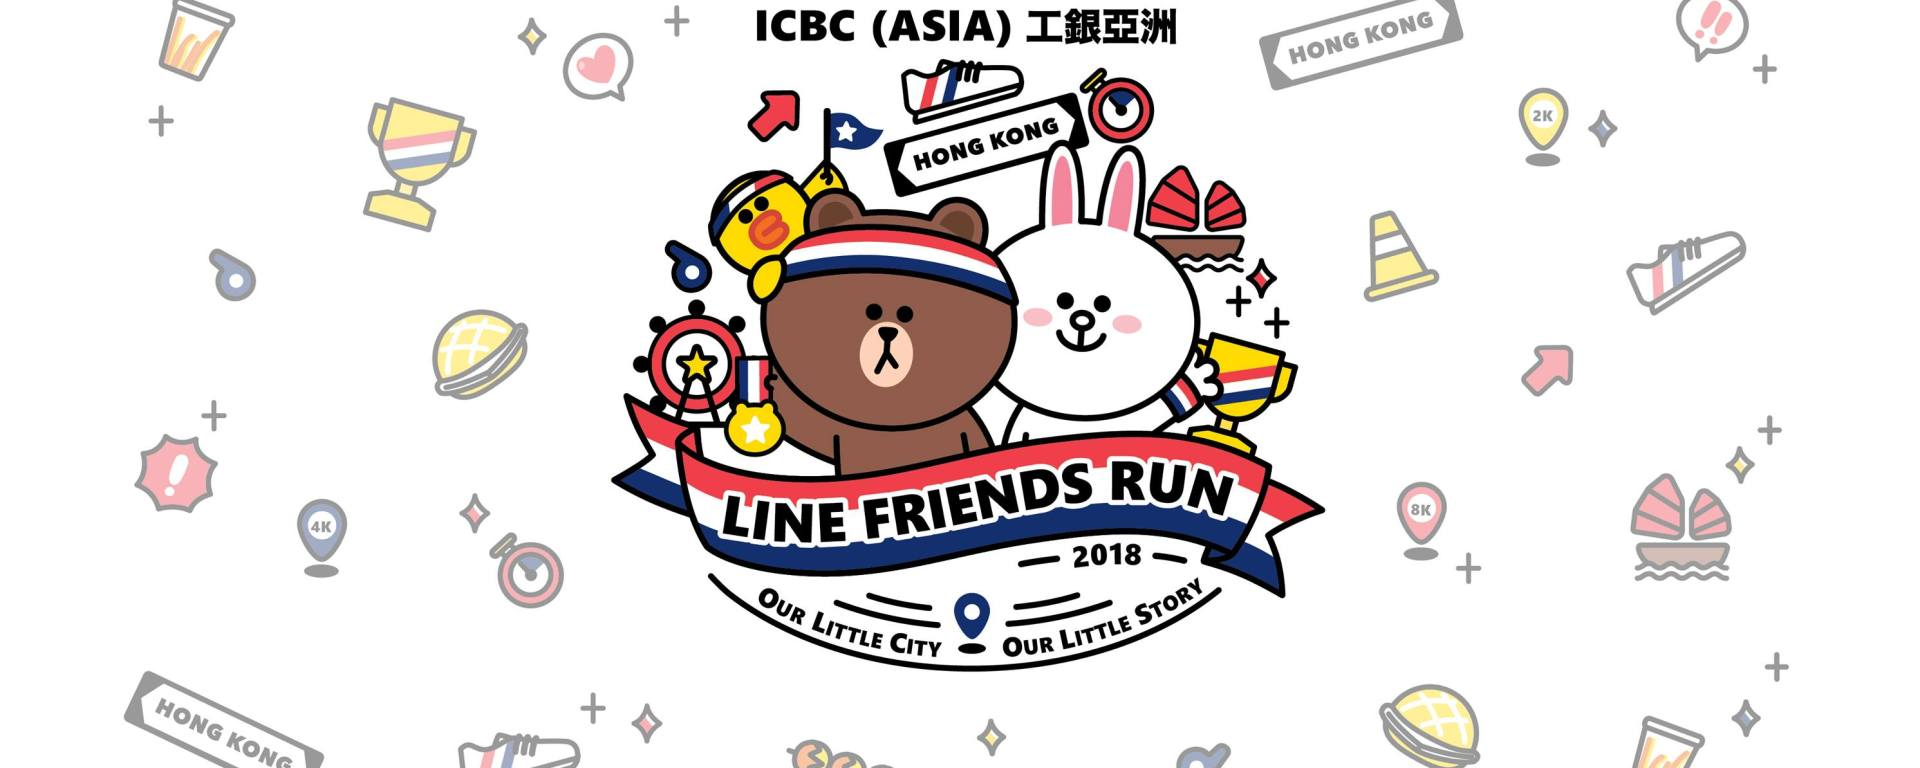 LINE FRIENDS RUN 2018 HK